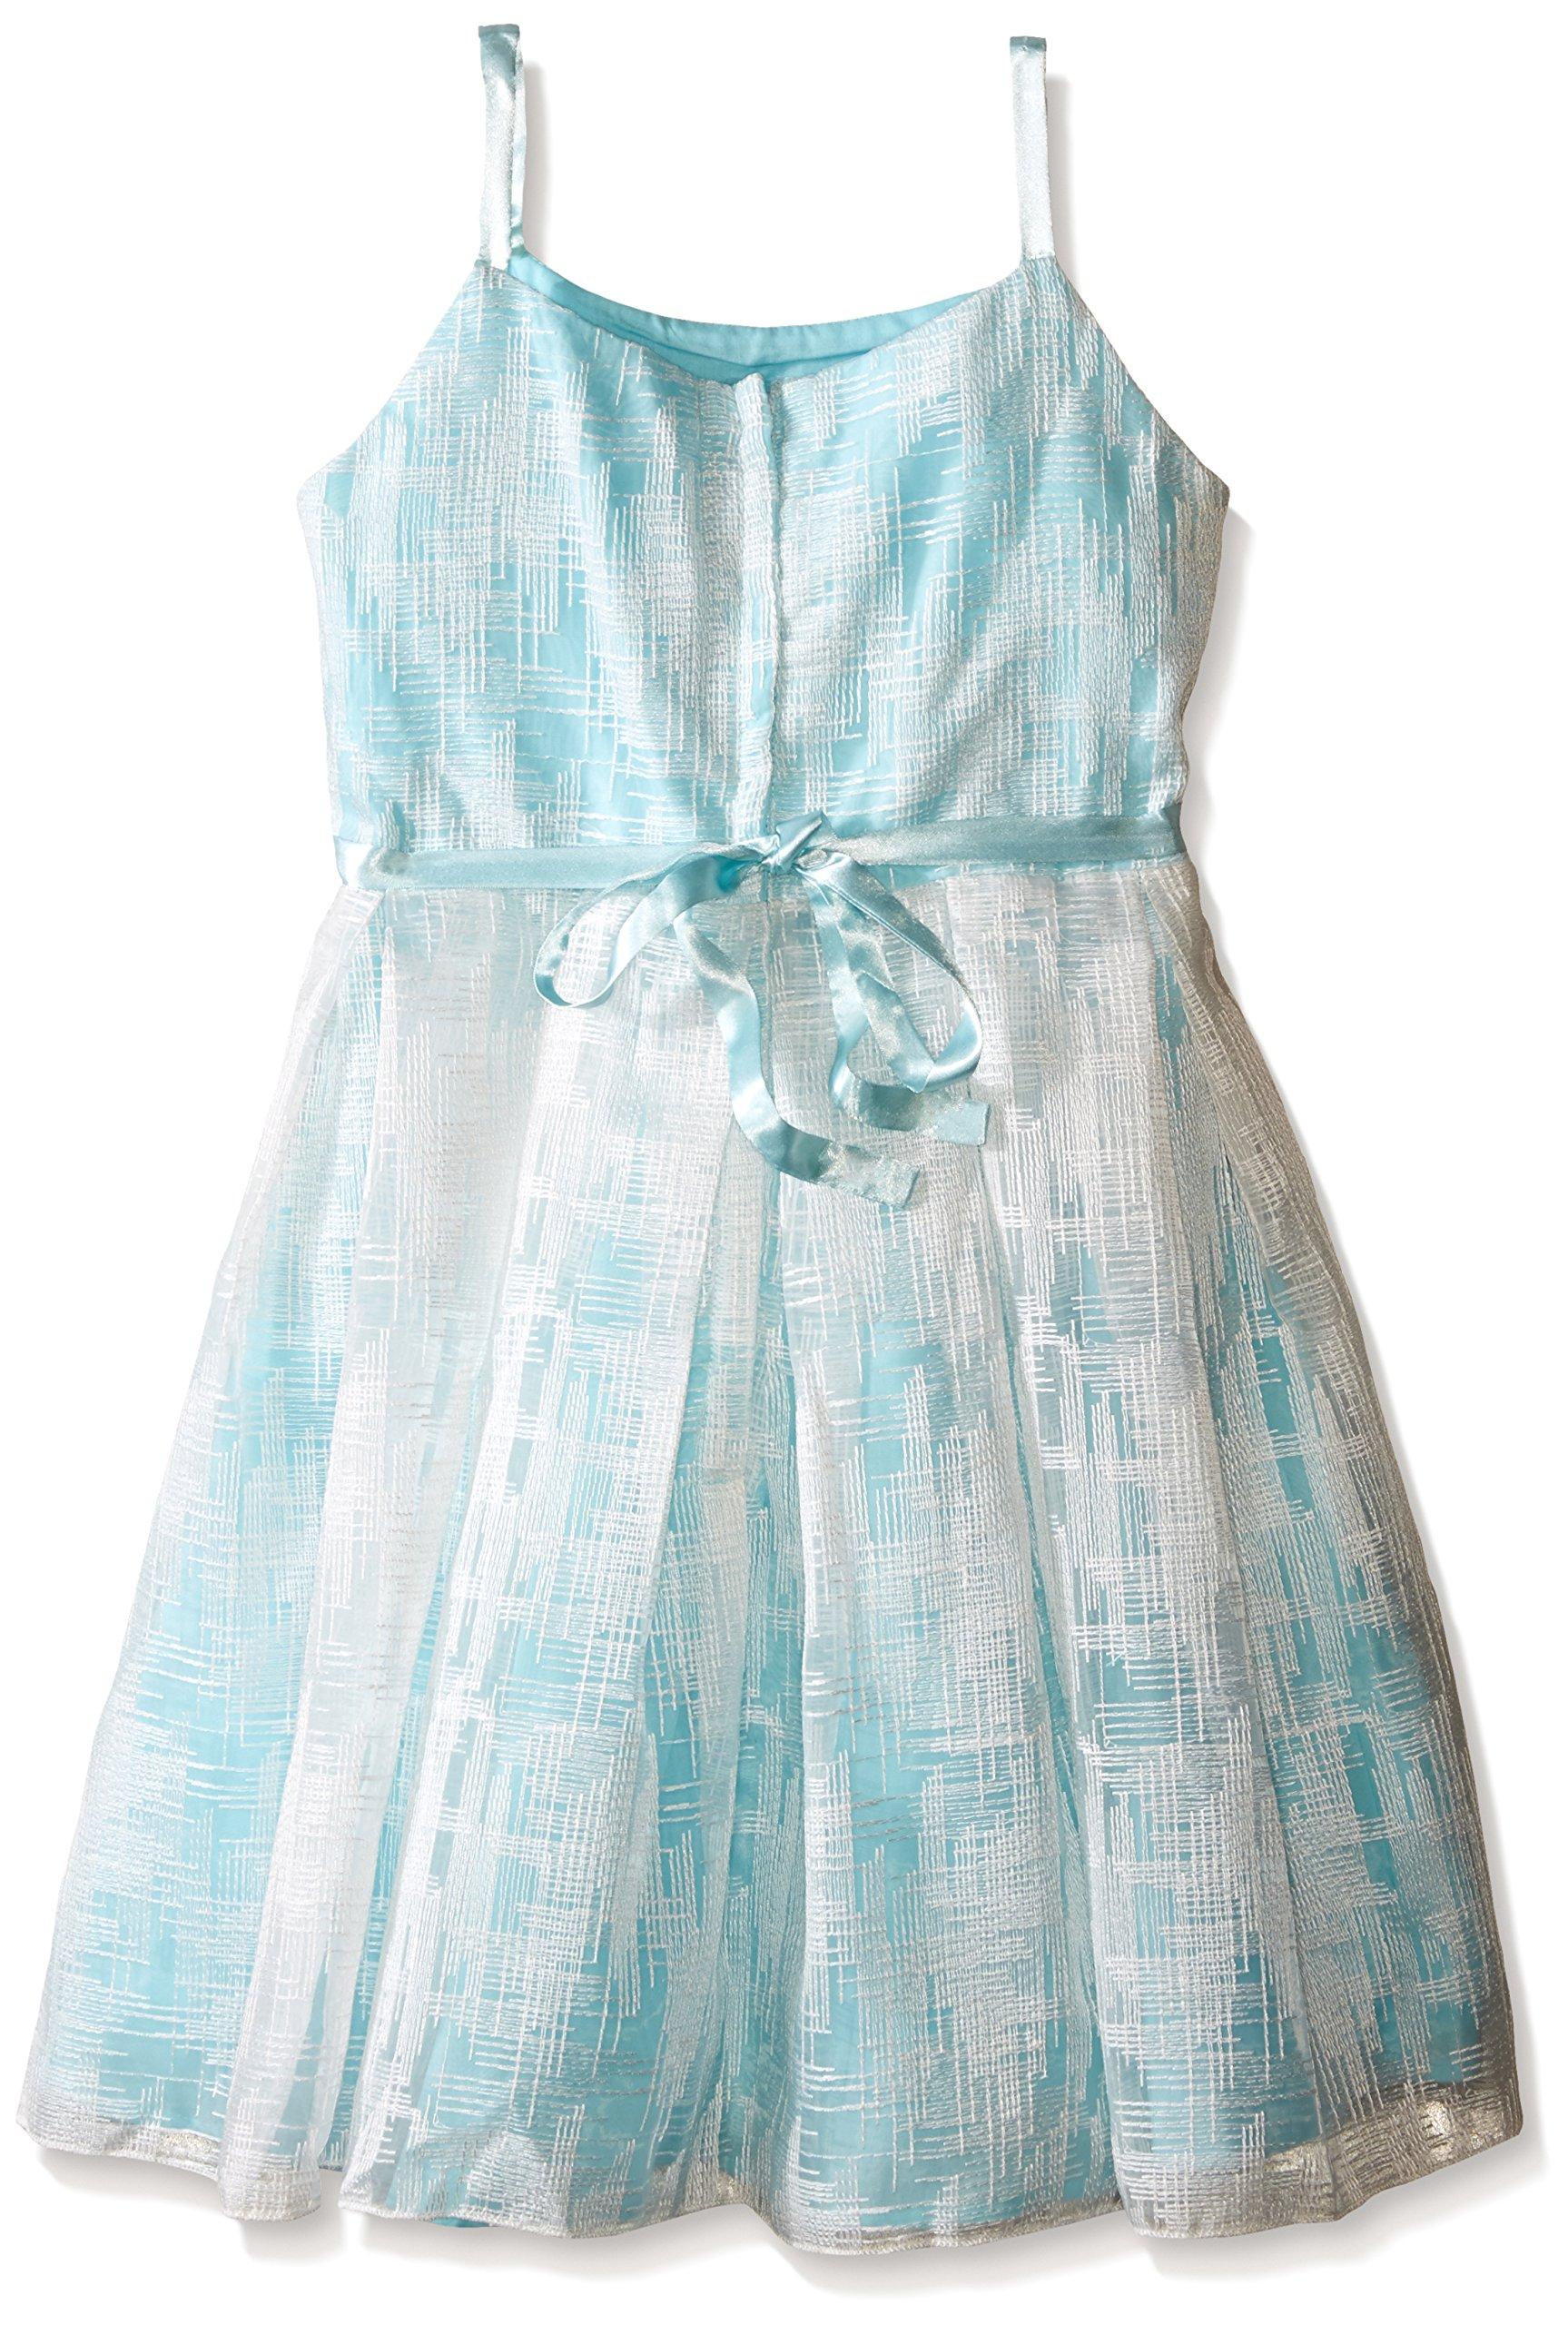 Biscotti Big Girls Tea Party Strappy Dress, Aqua, 7 by Biscotti (Image #2)